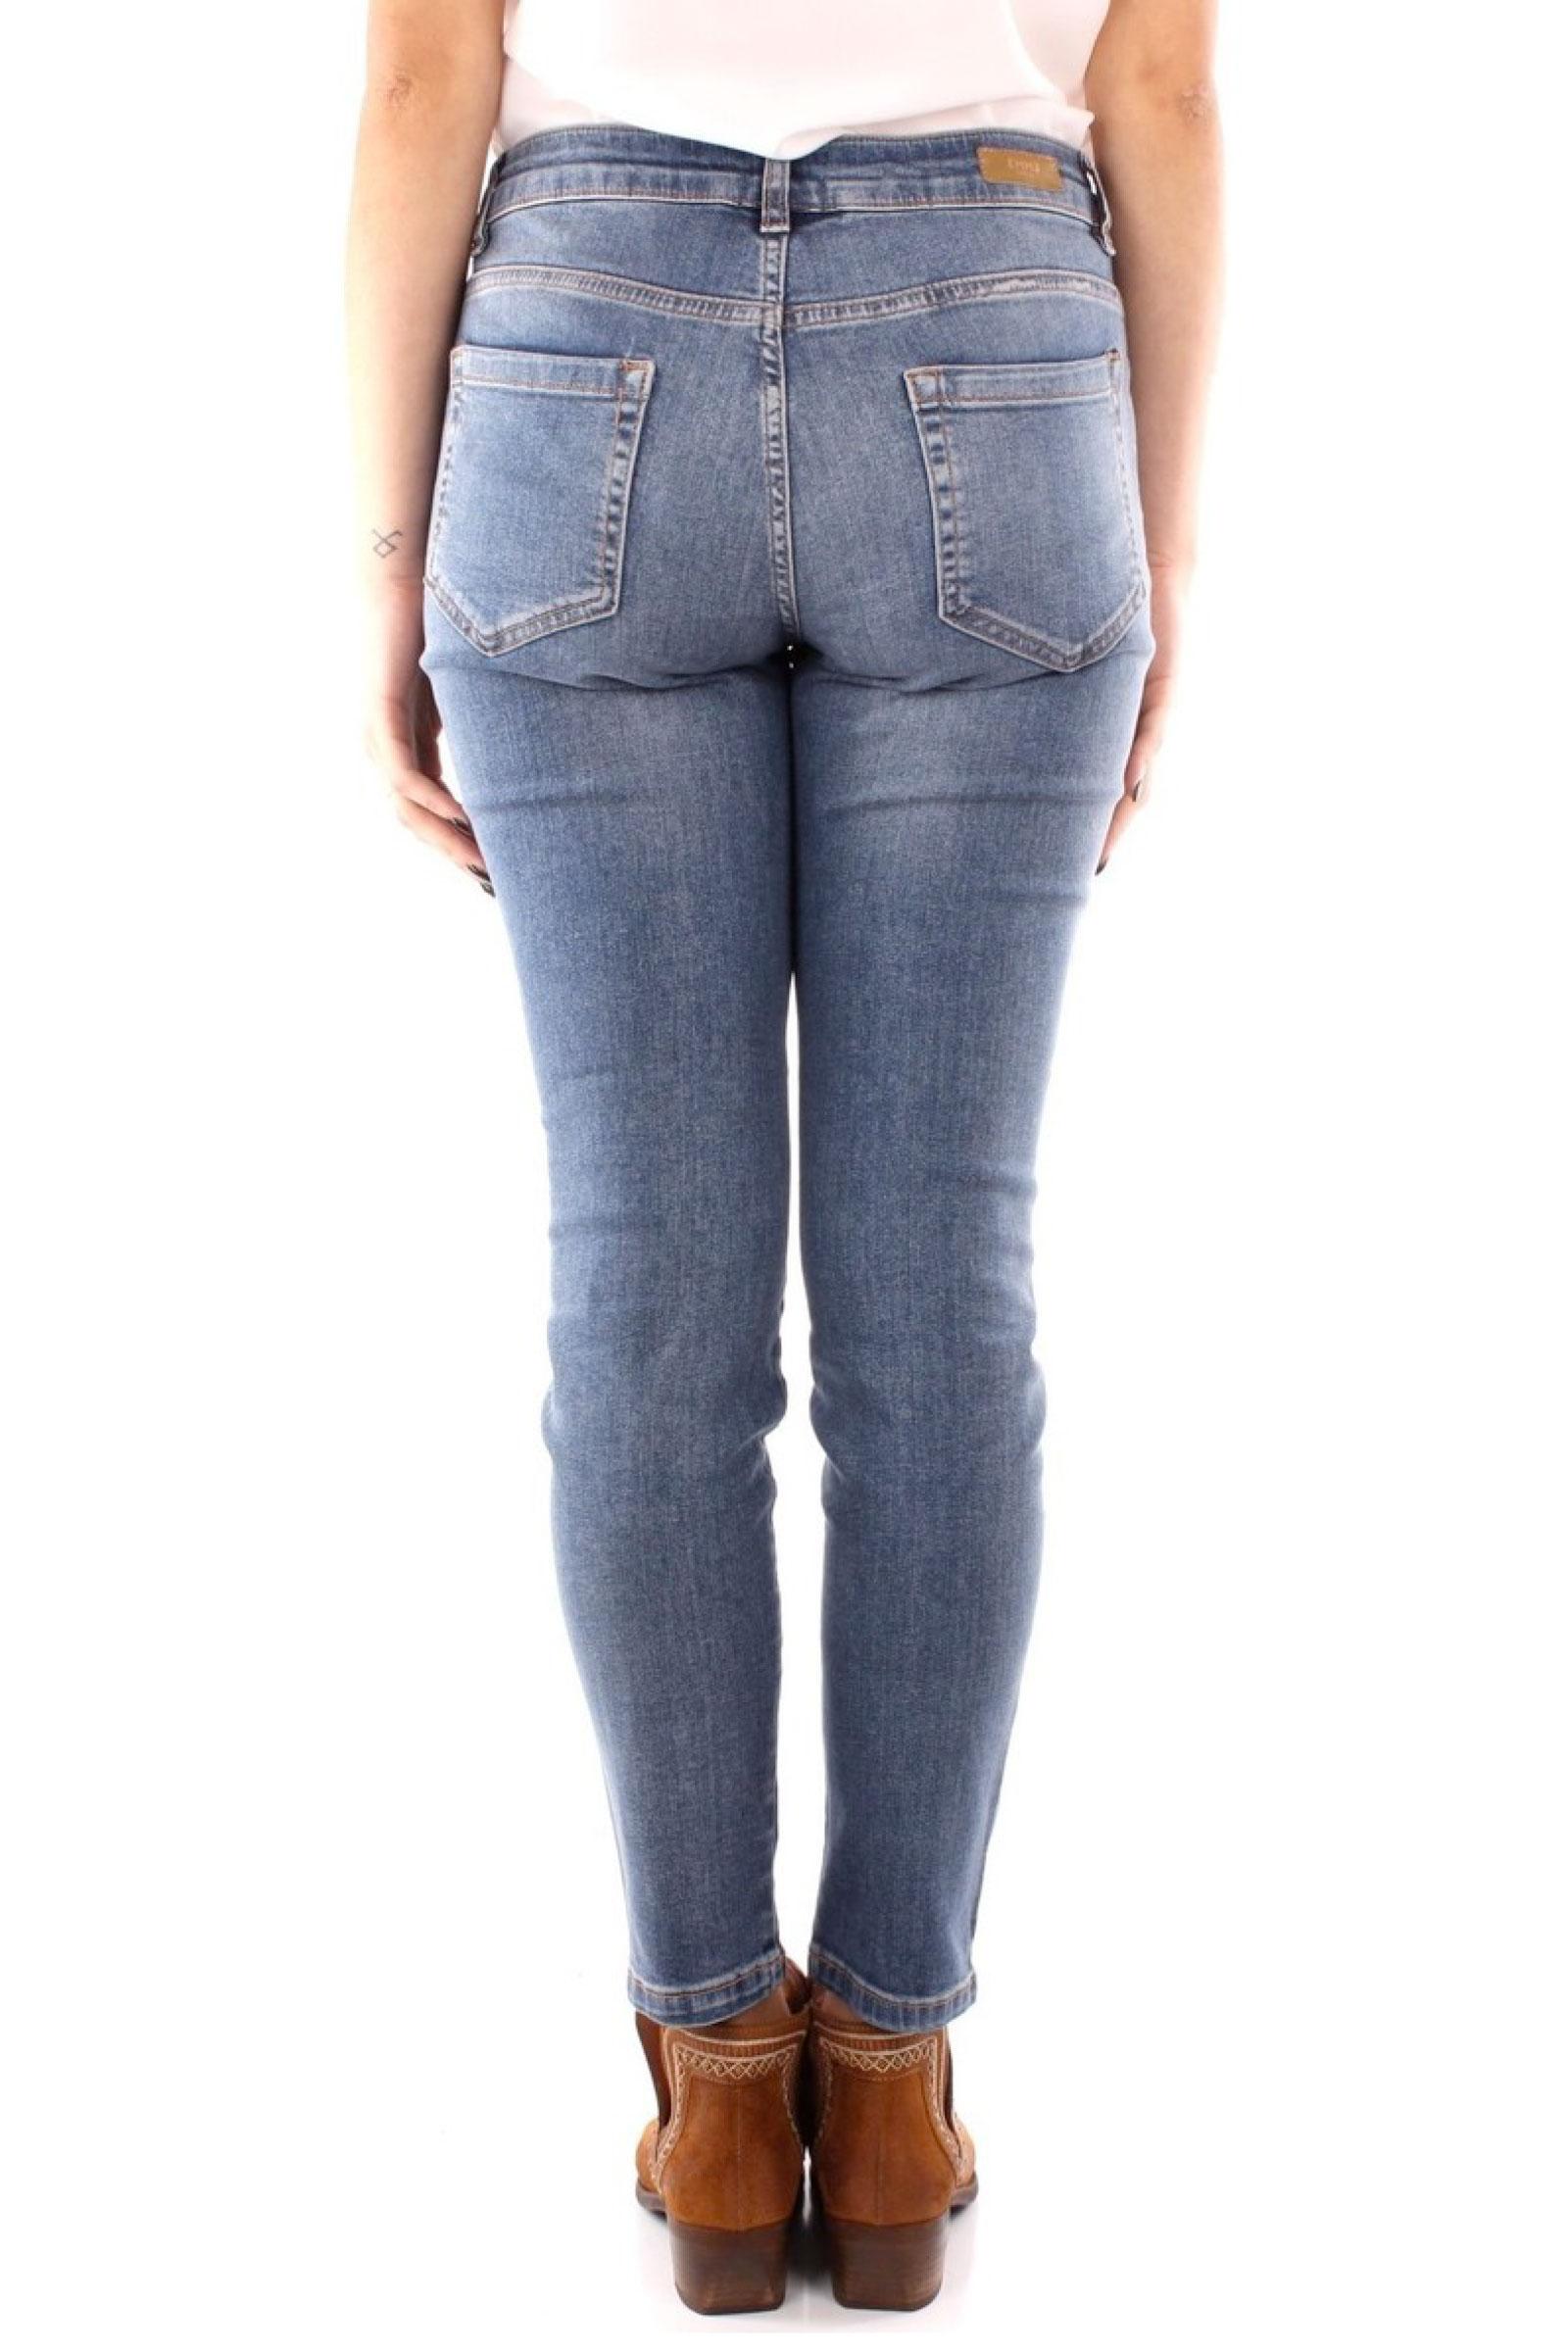 EMME MARELLA | Jeans | 51810615000003